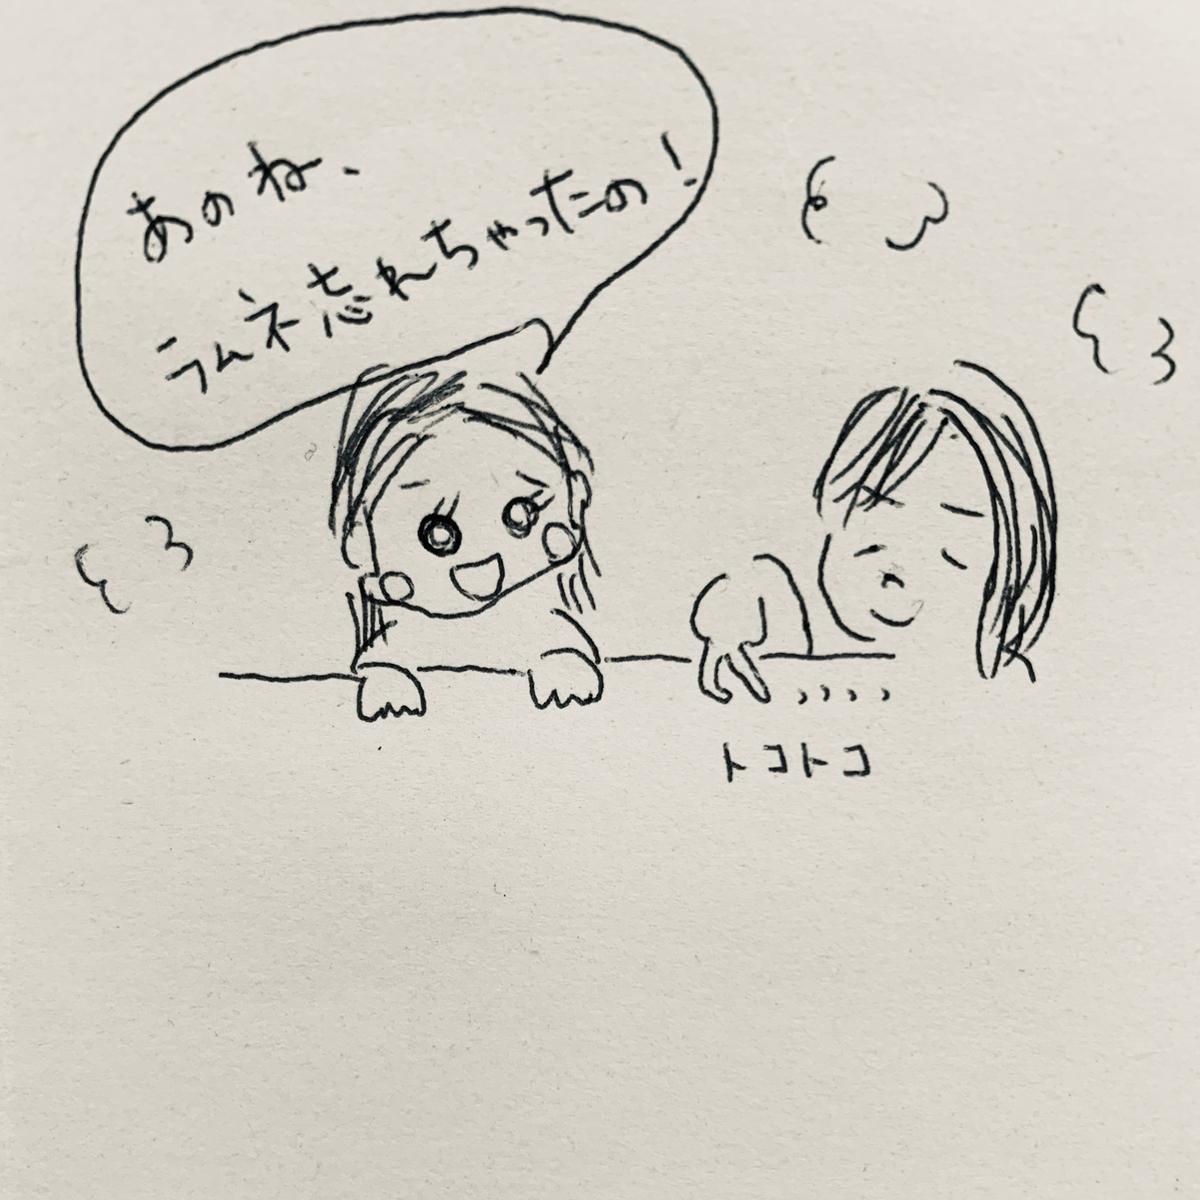 f:id:nananan0:20190417094510j:plain